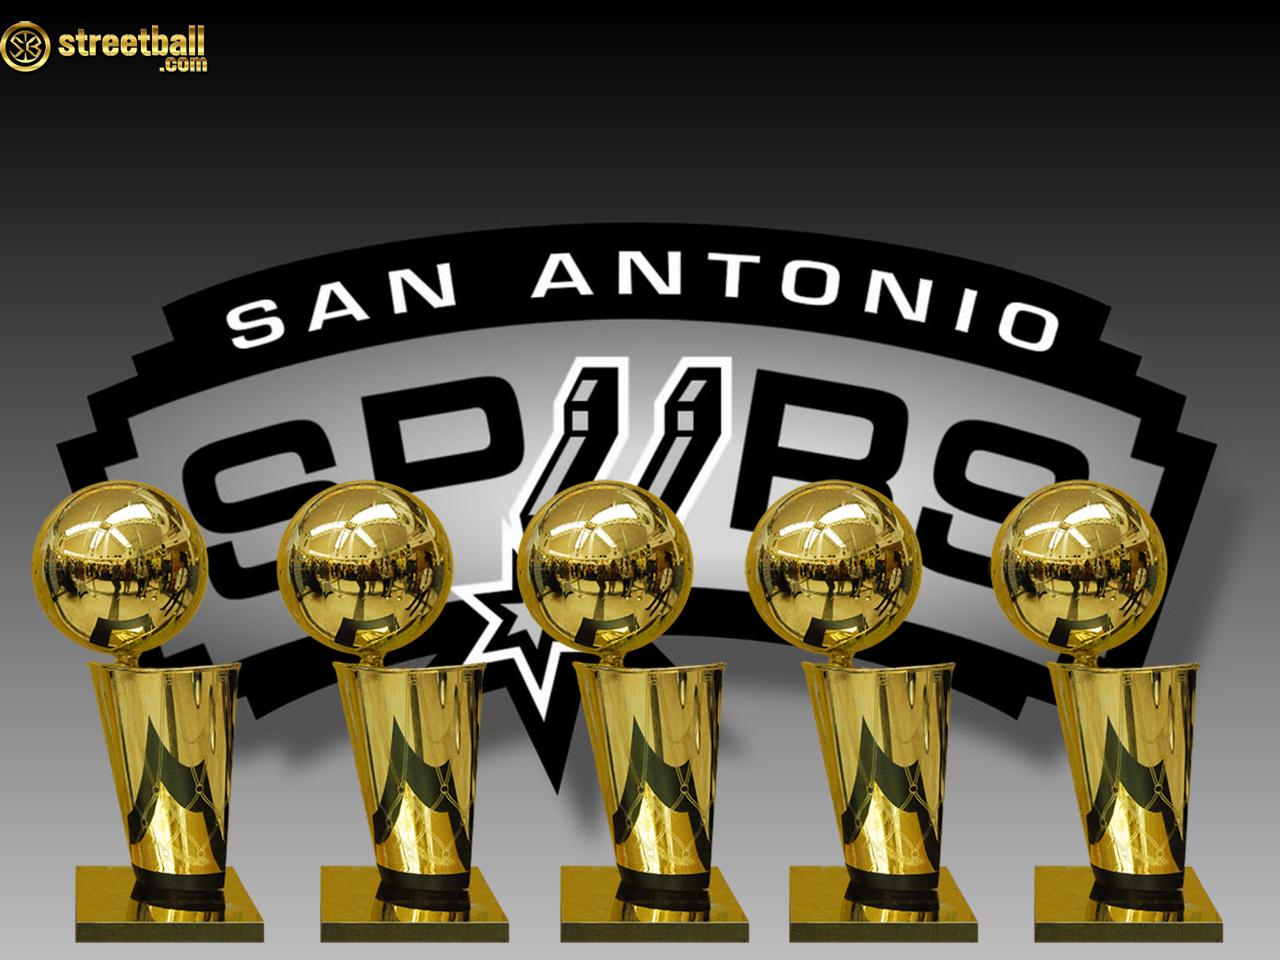 Spurs Hd Nba Champions Wallpaper San Antonio Spurs Basketball San Antonio Spurs Championships Spurs Basketball